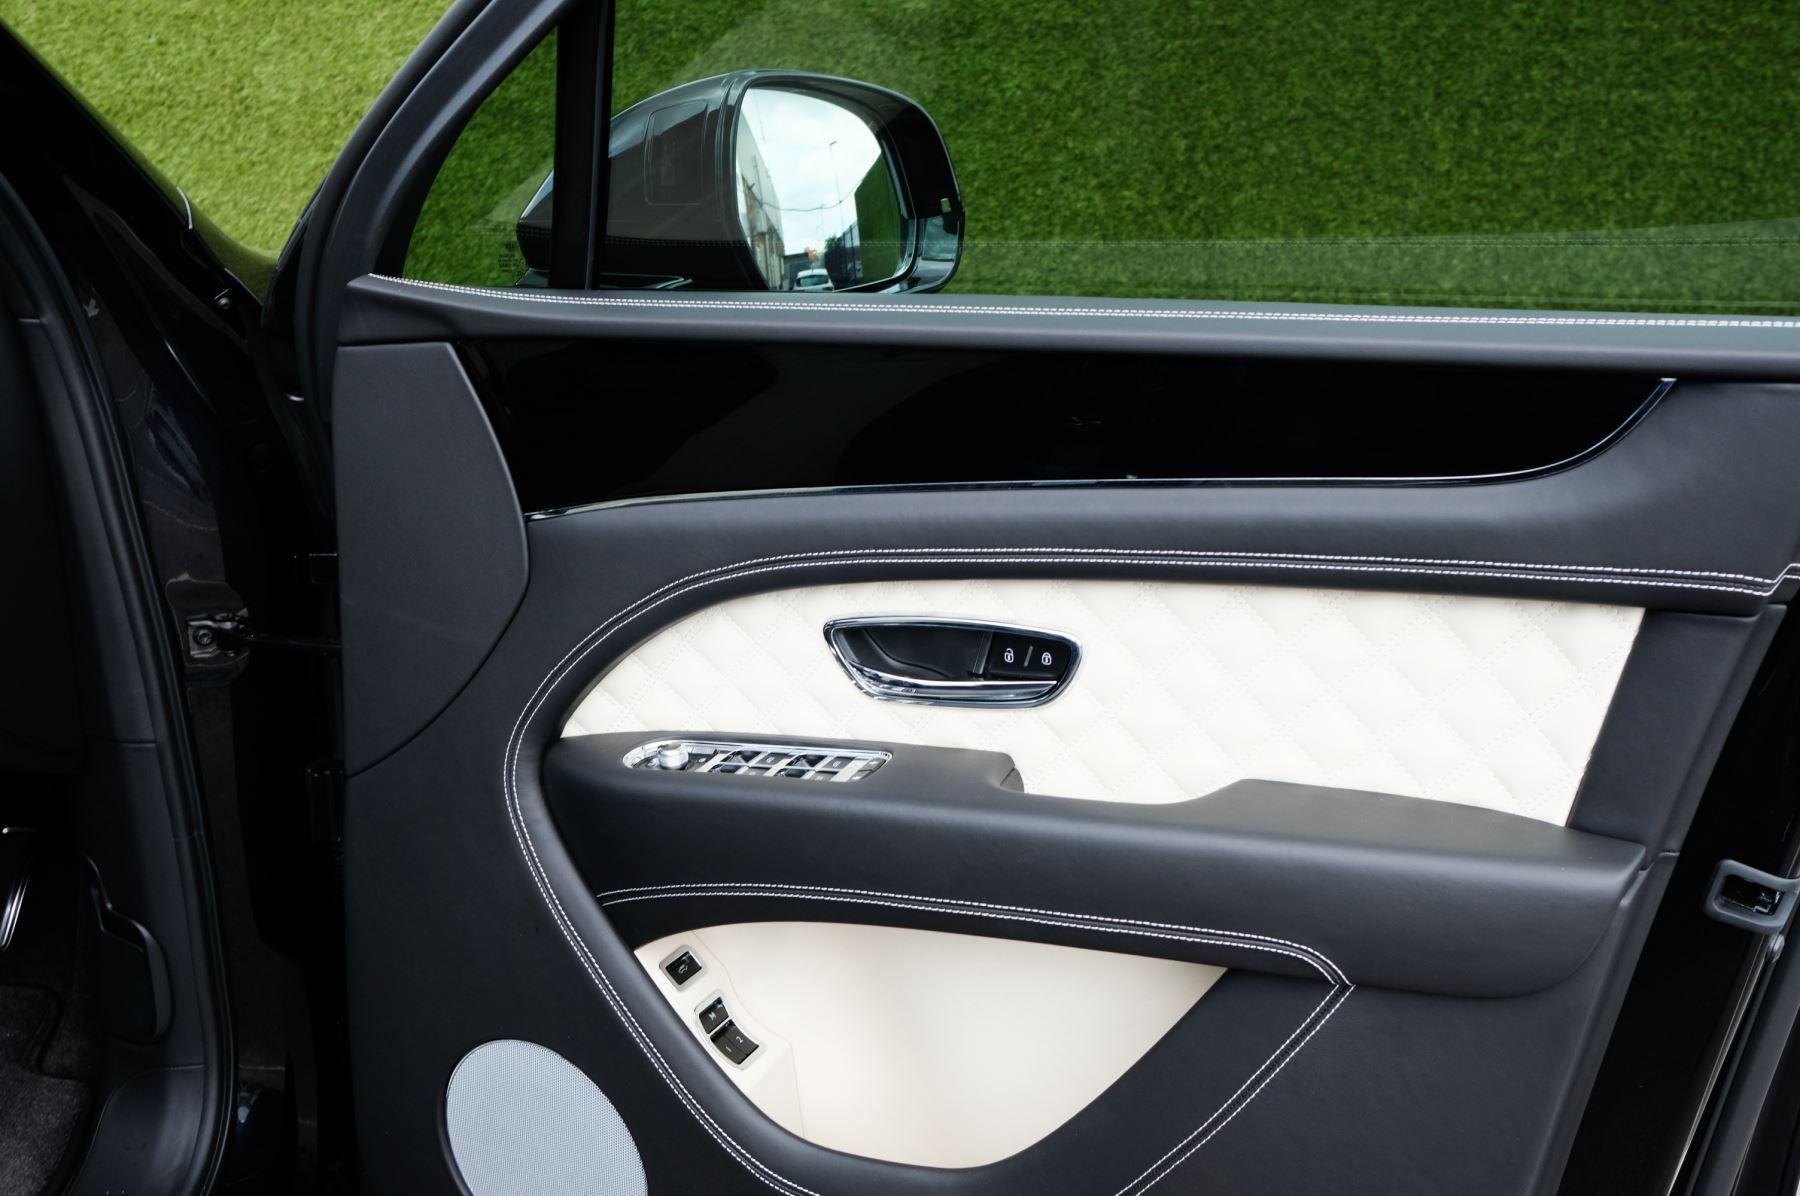 Bentley Bentayga 4.0 V8 - Mulliner Driving Specification for Black Specification image 13